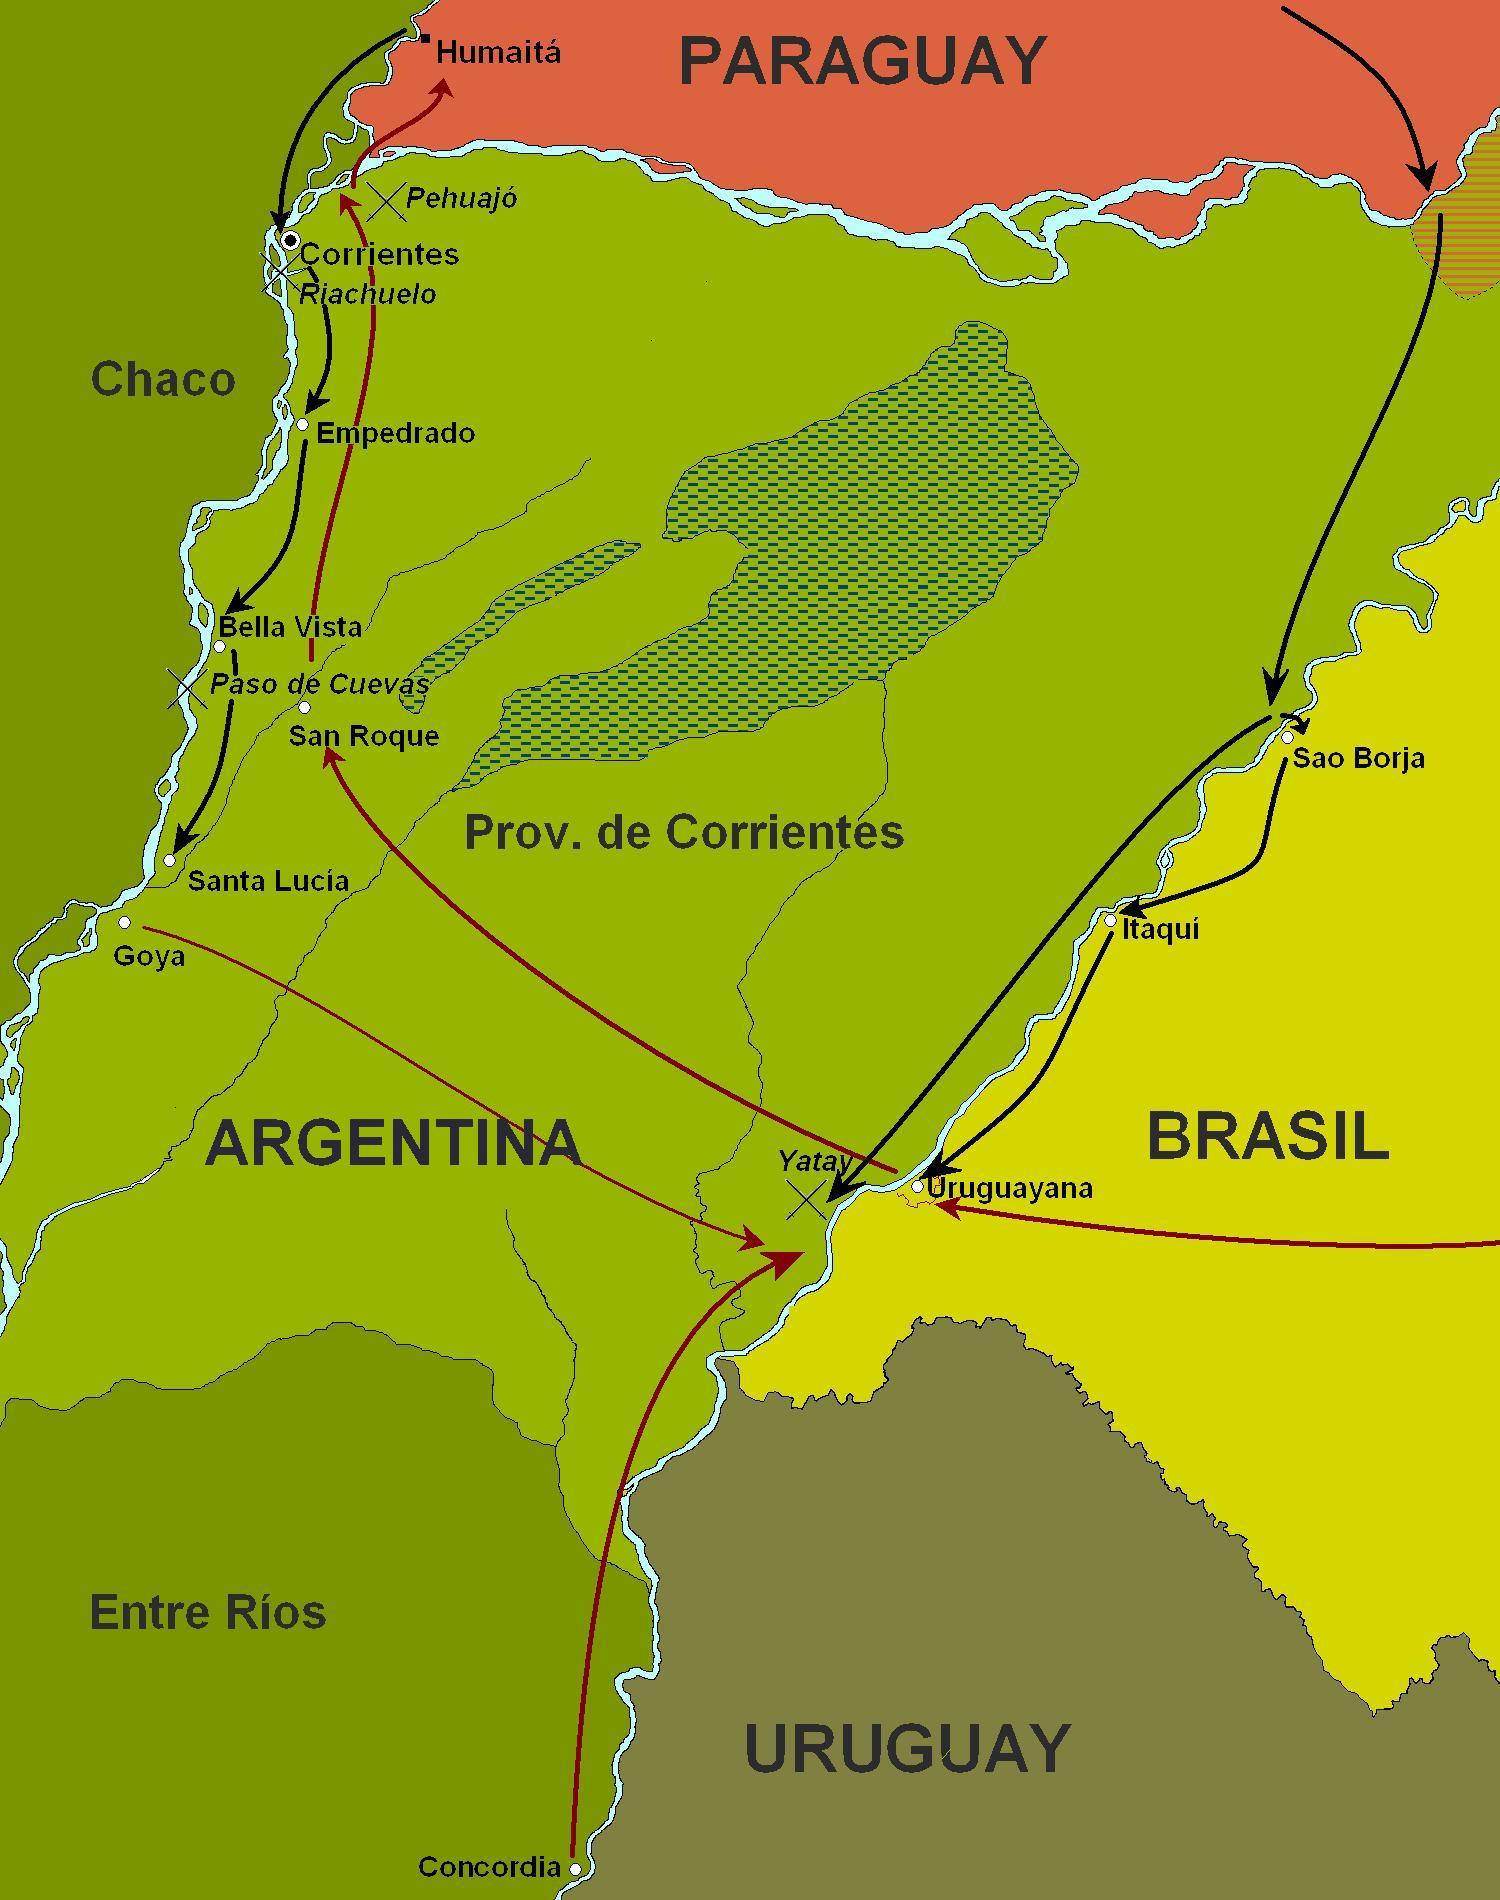 https://upload.wikimedia.org/wikipedia/commons/6/63/Campa%C3%B1a_de_Corrientes_2.jpg